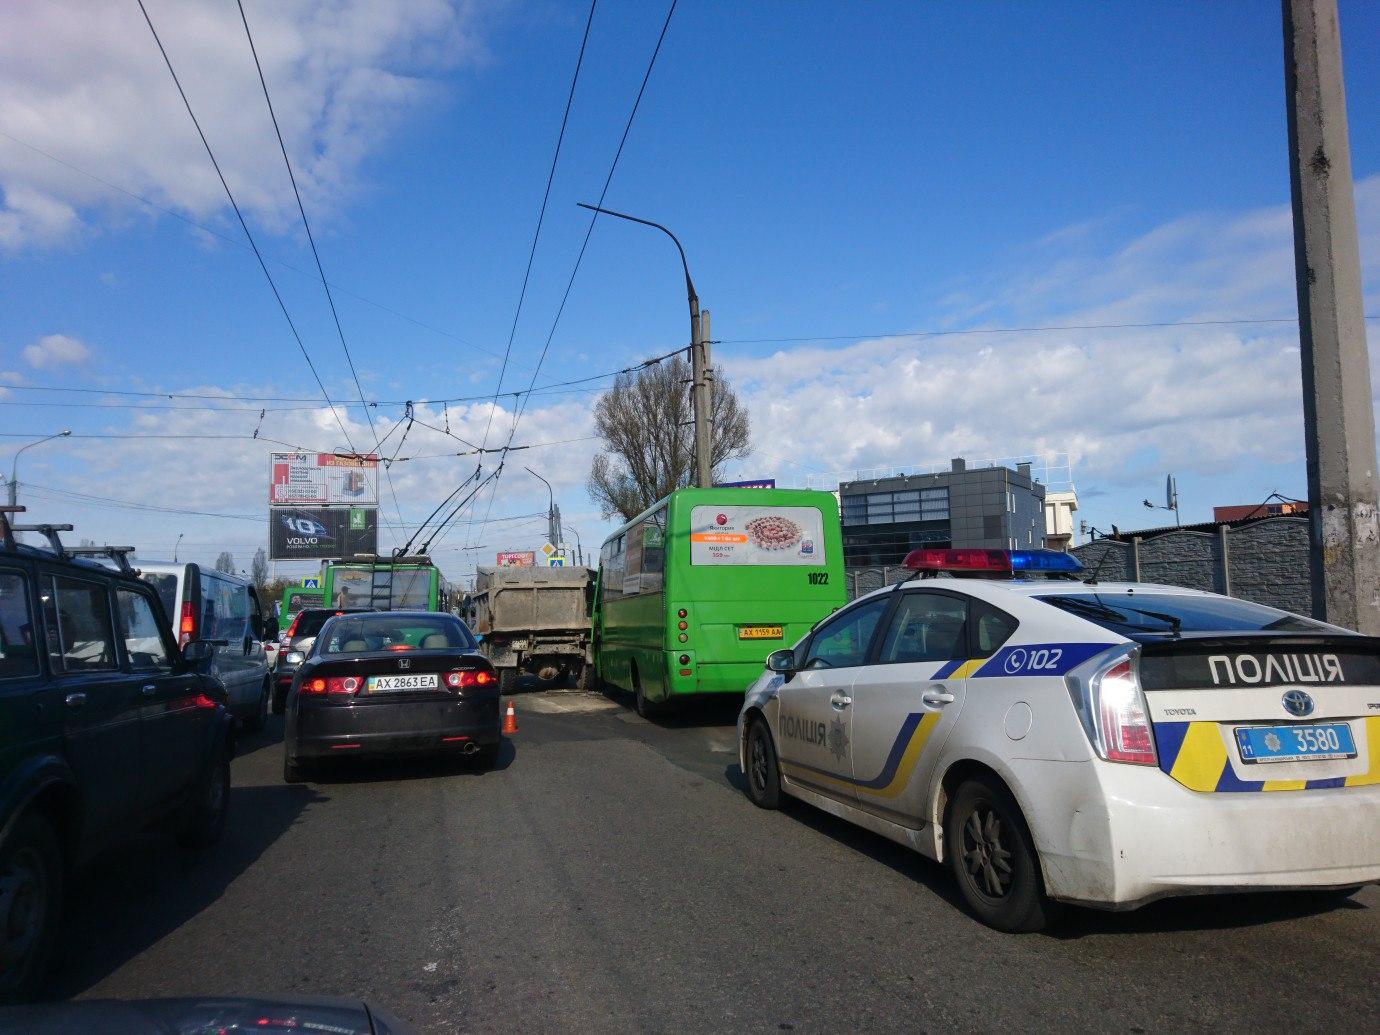 ЧП в Харькове. Из-за неисправности автобуса пострадали люди (фото)